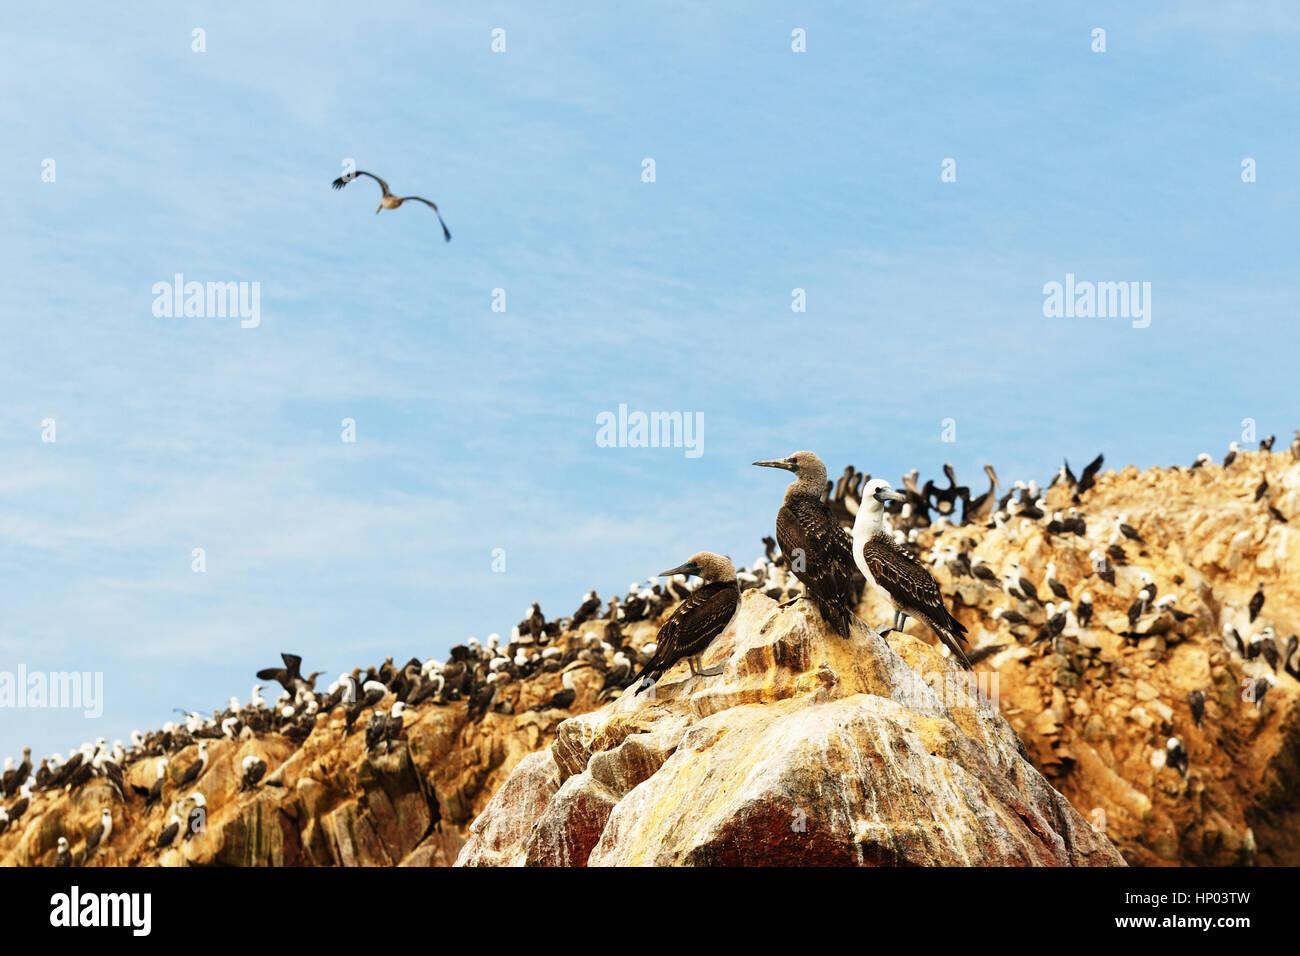 Ica stone stockfotos ica stone bilder alamy for Wildparks in der nahe